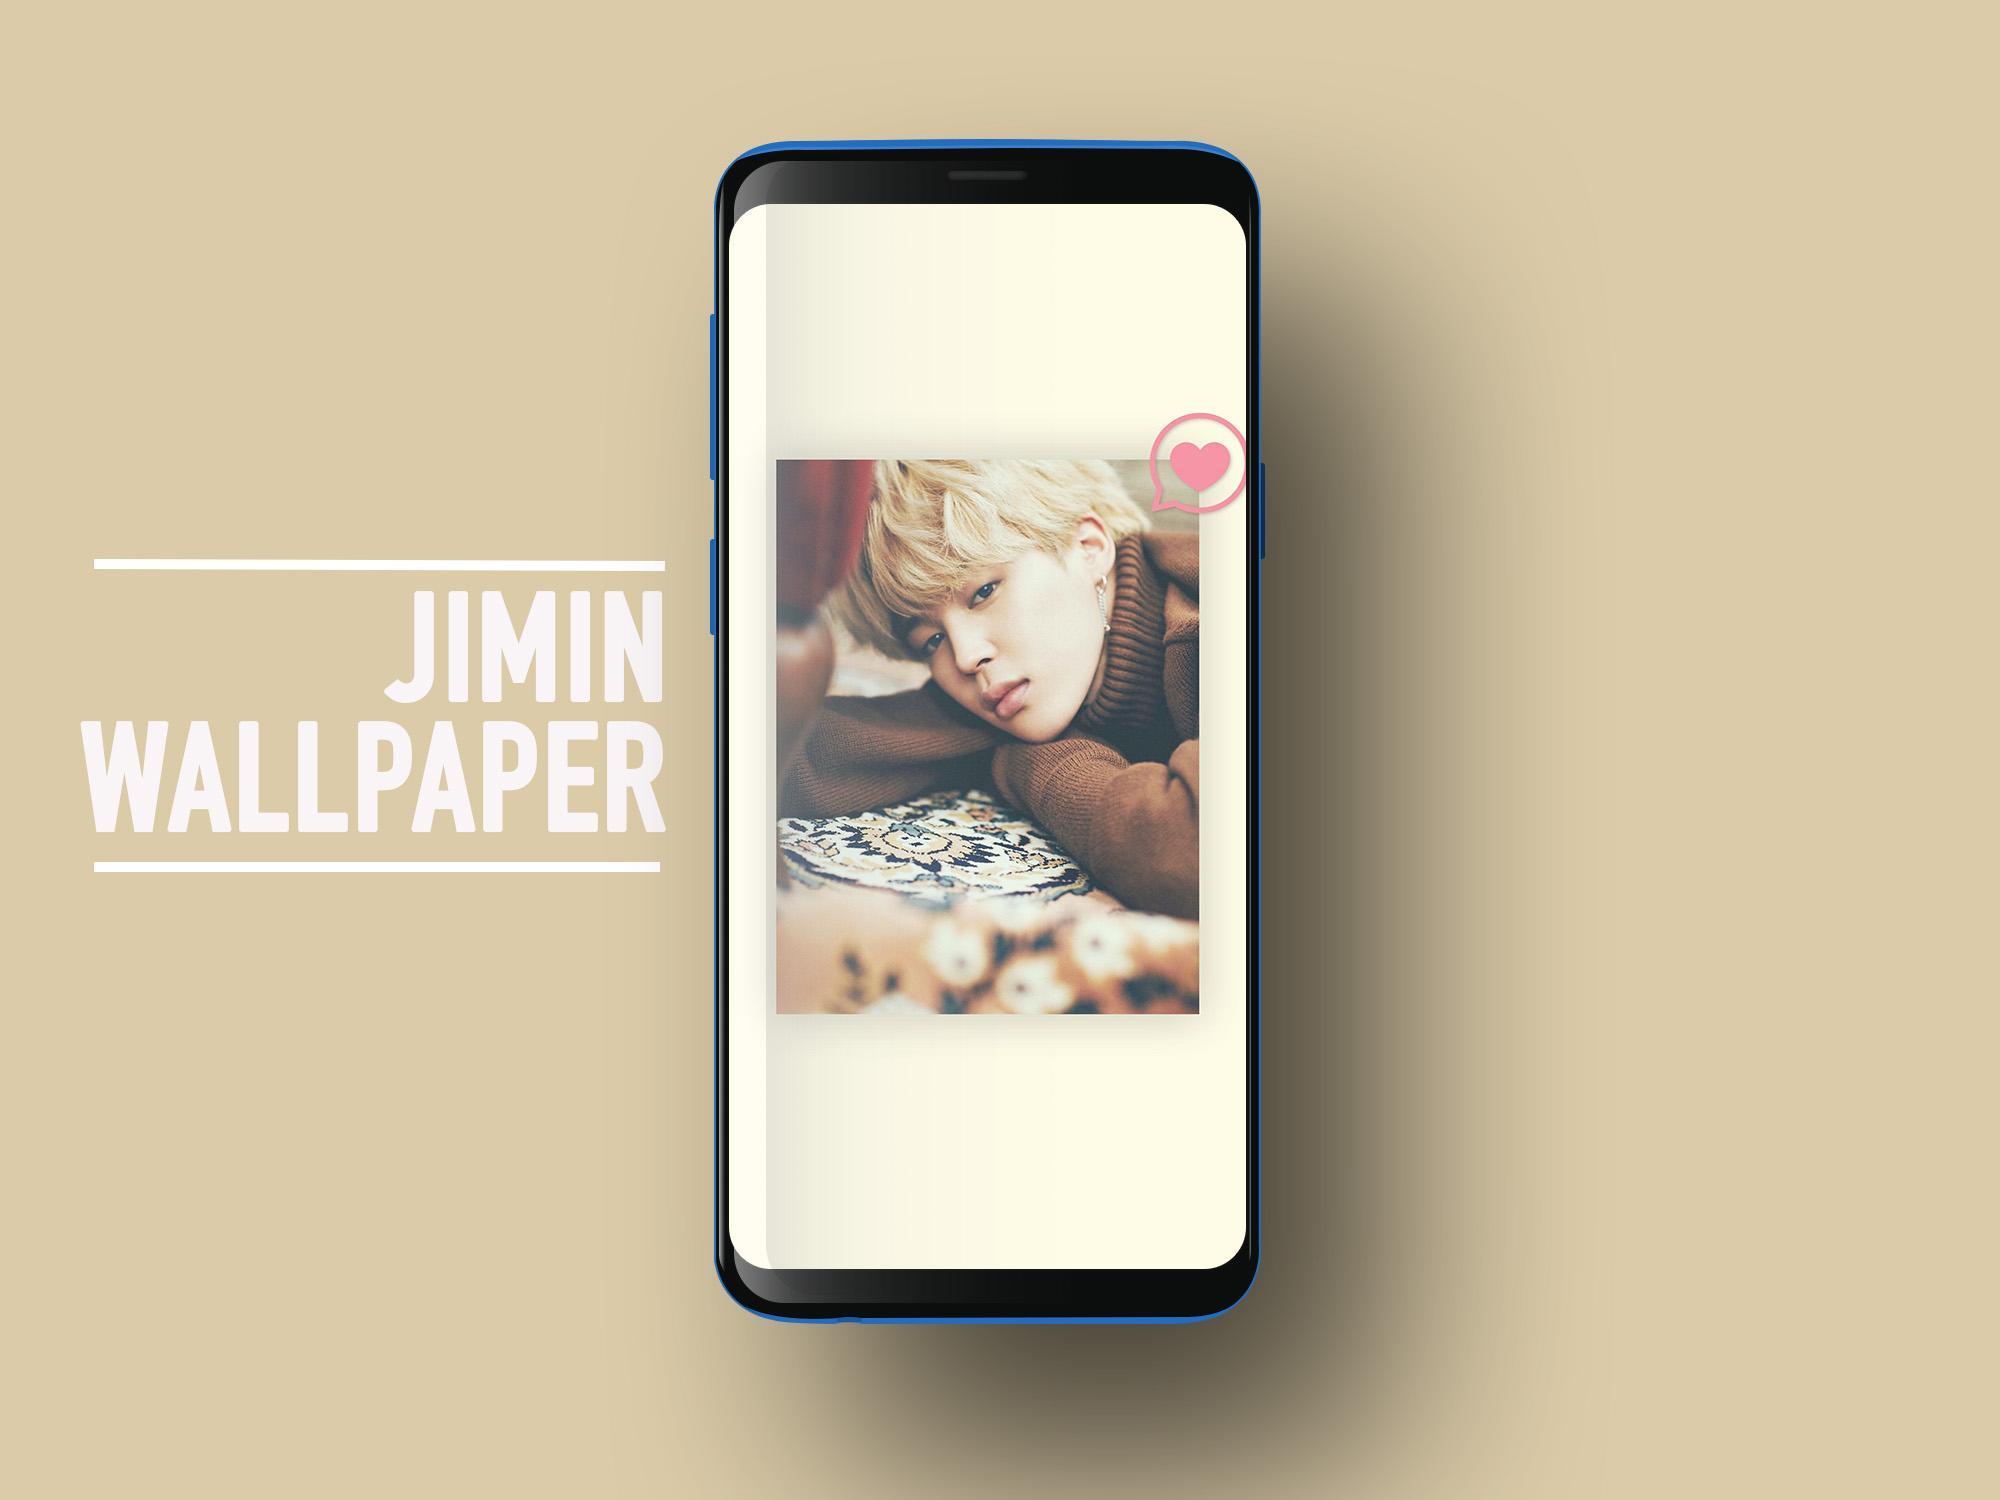 Bts Jimin Wallpaper Kpop Fans Hd For Android Apk Download